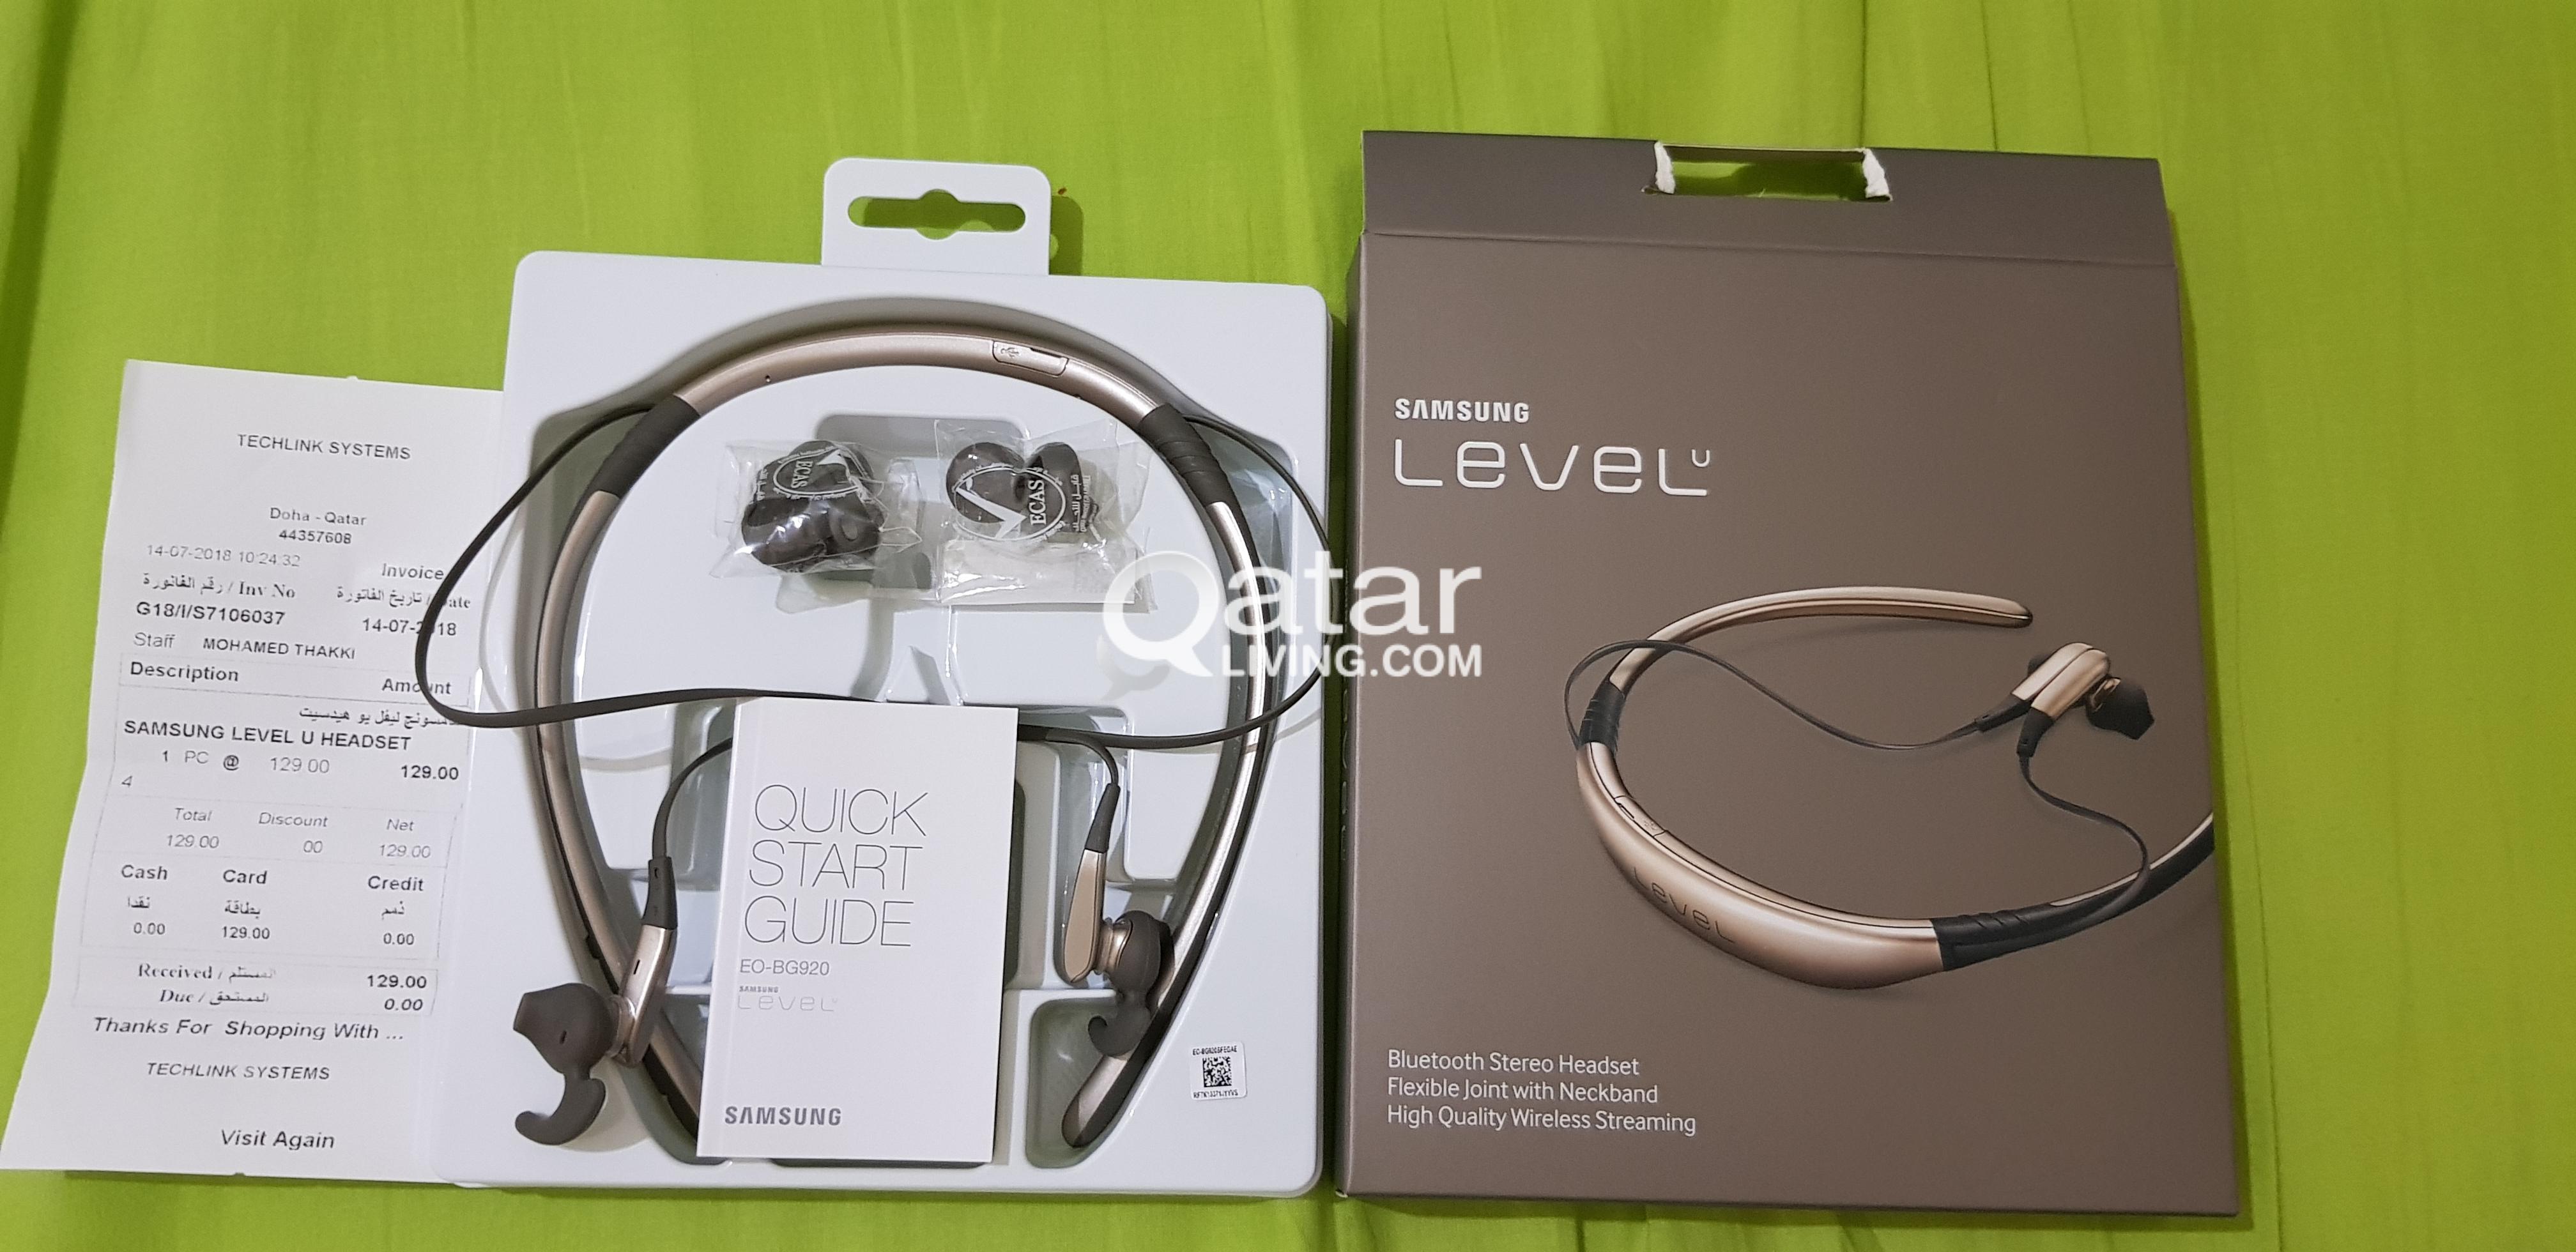 Samsung Level U Headset Qatar Living